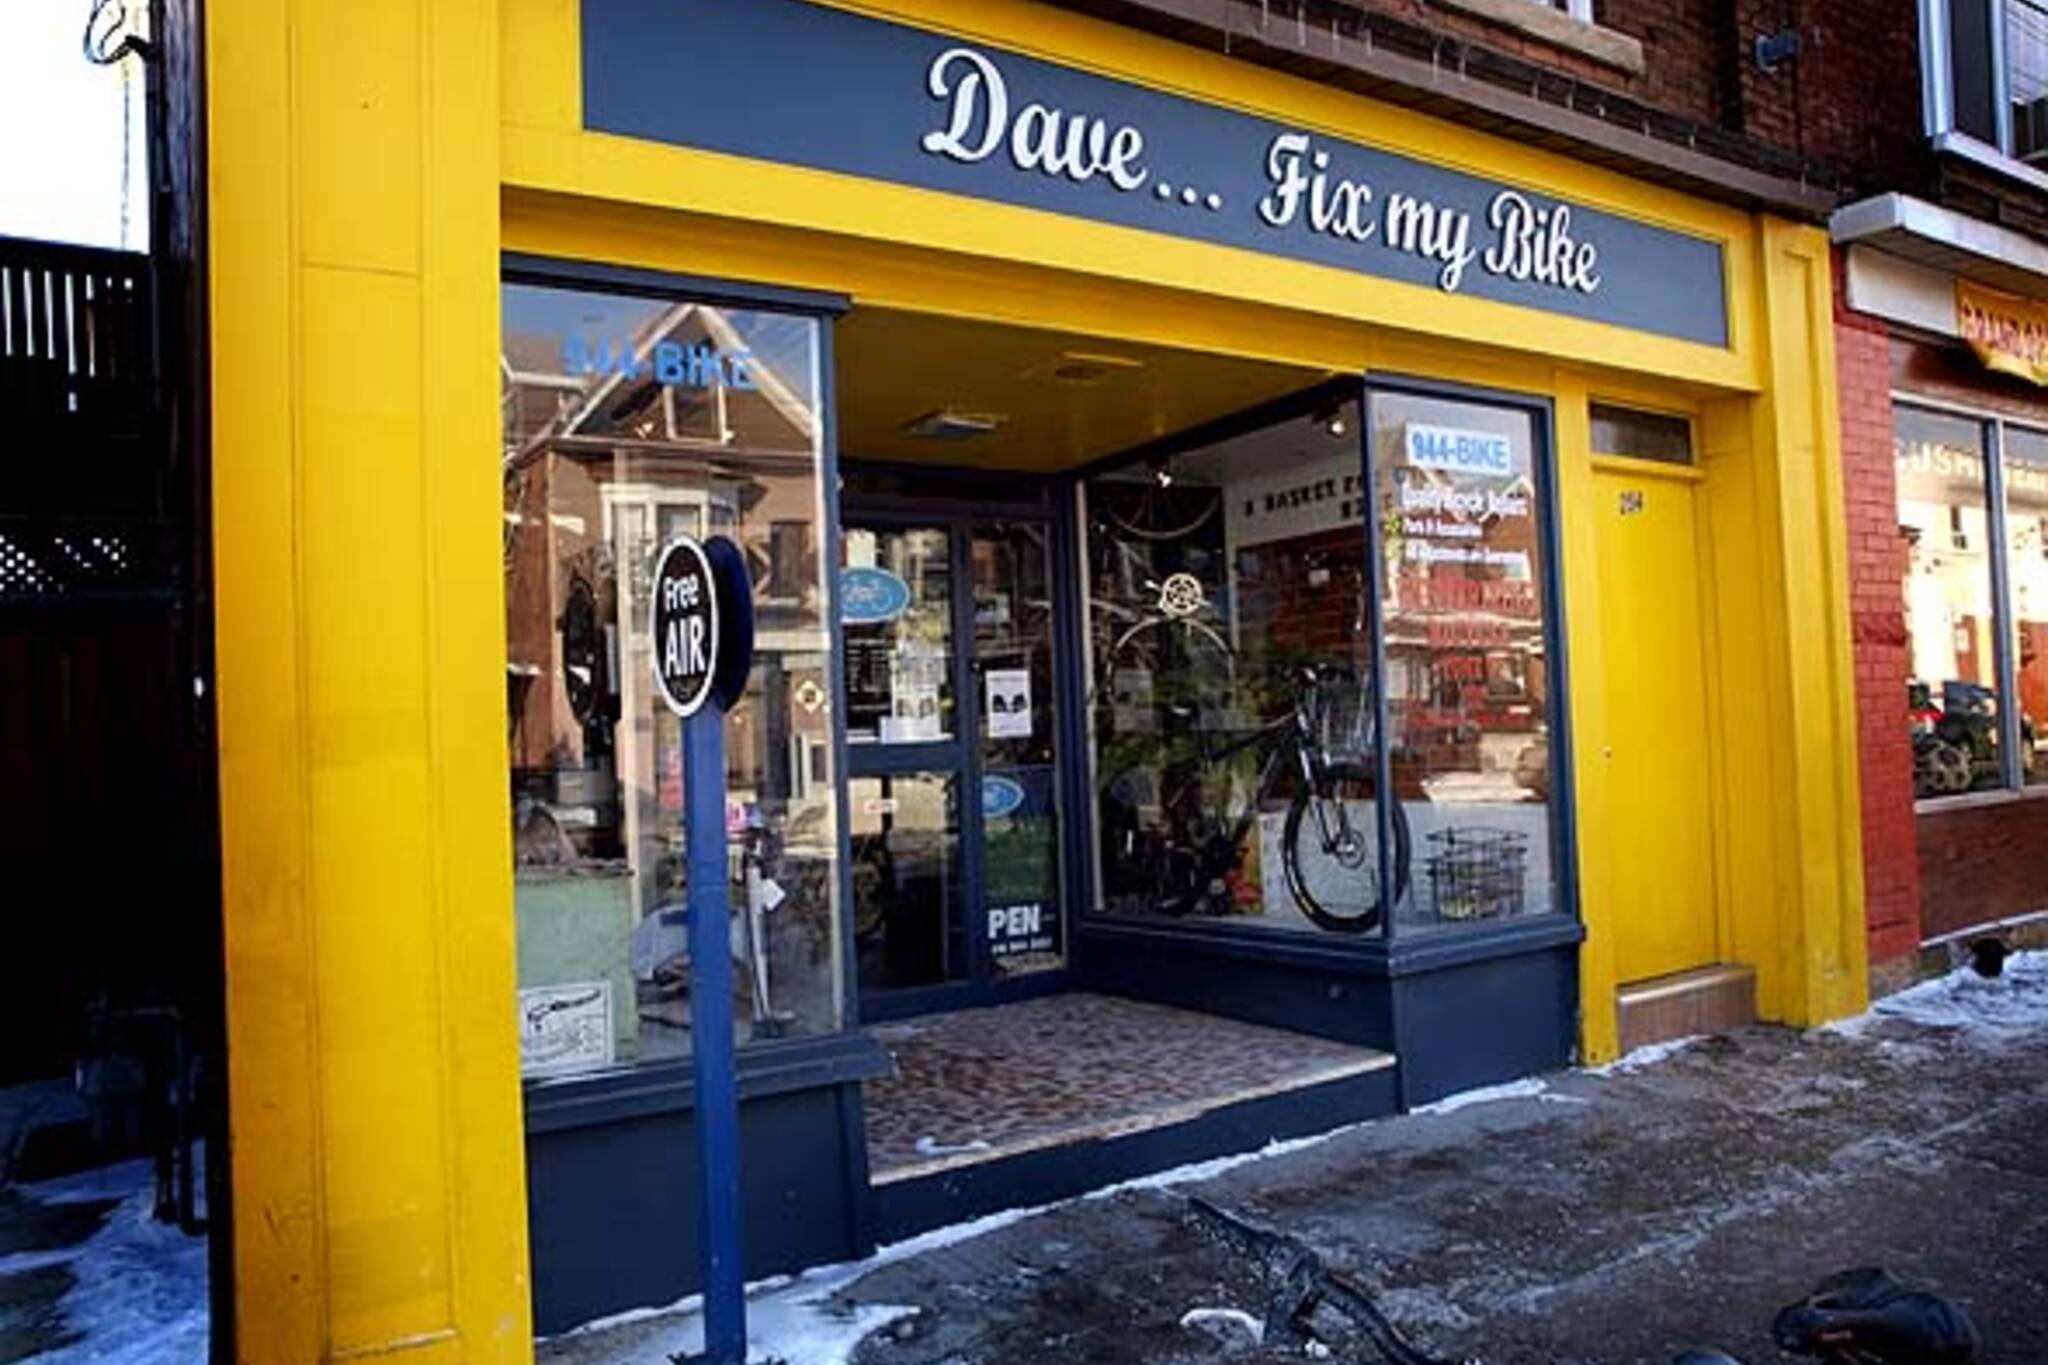 Dave Fix My Bike